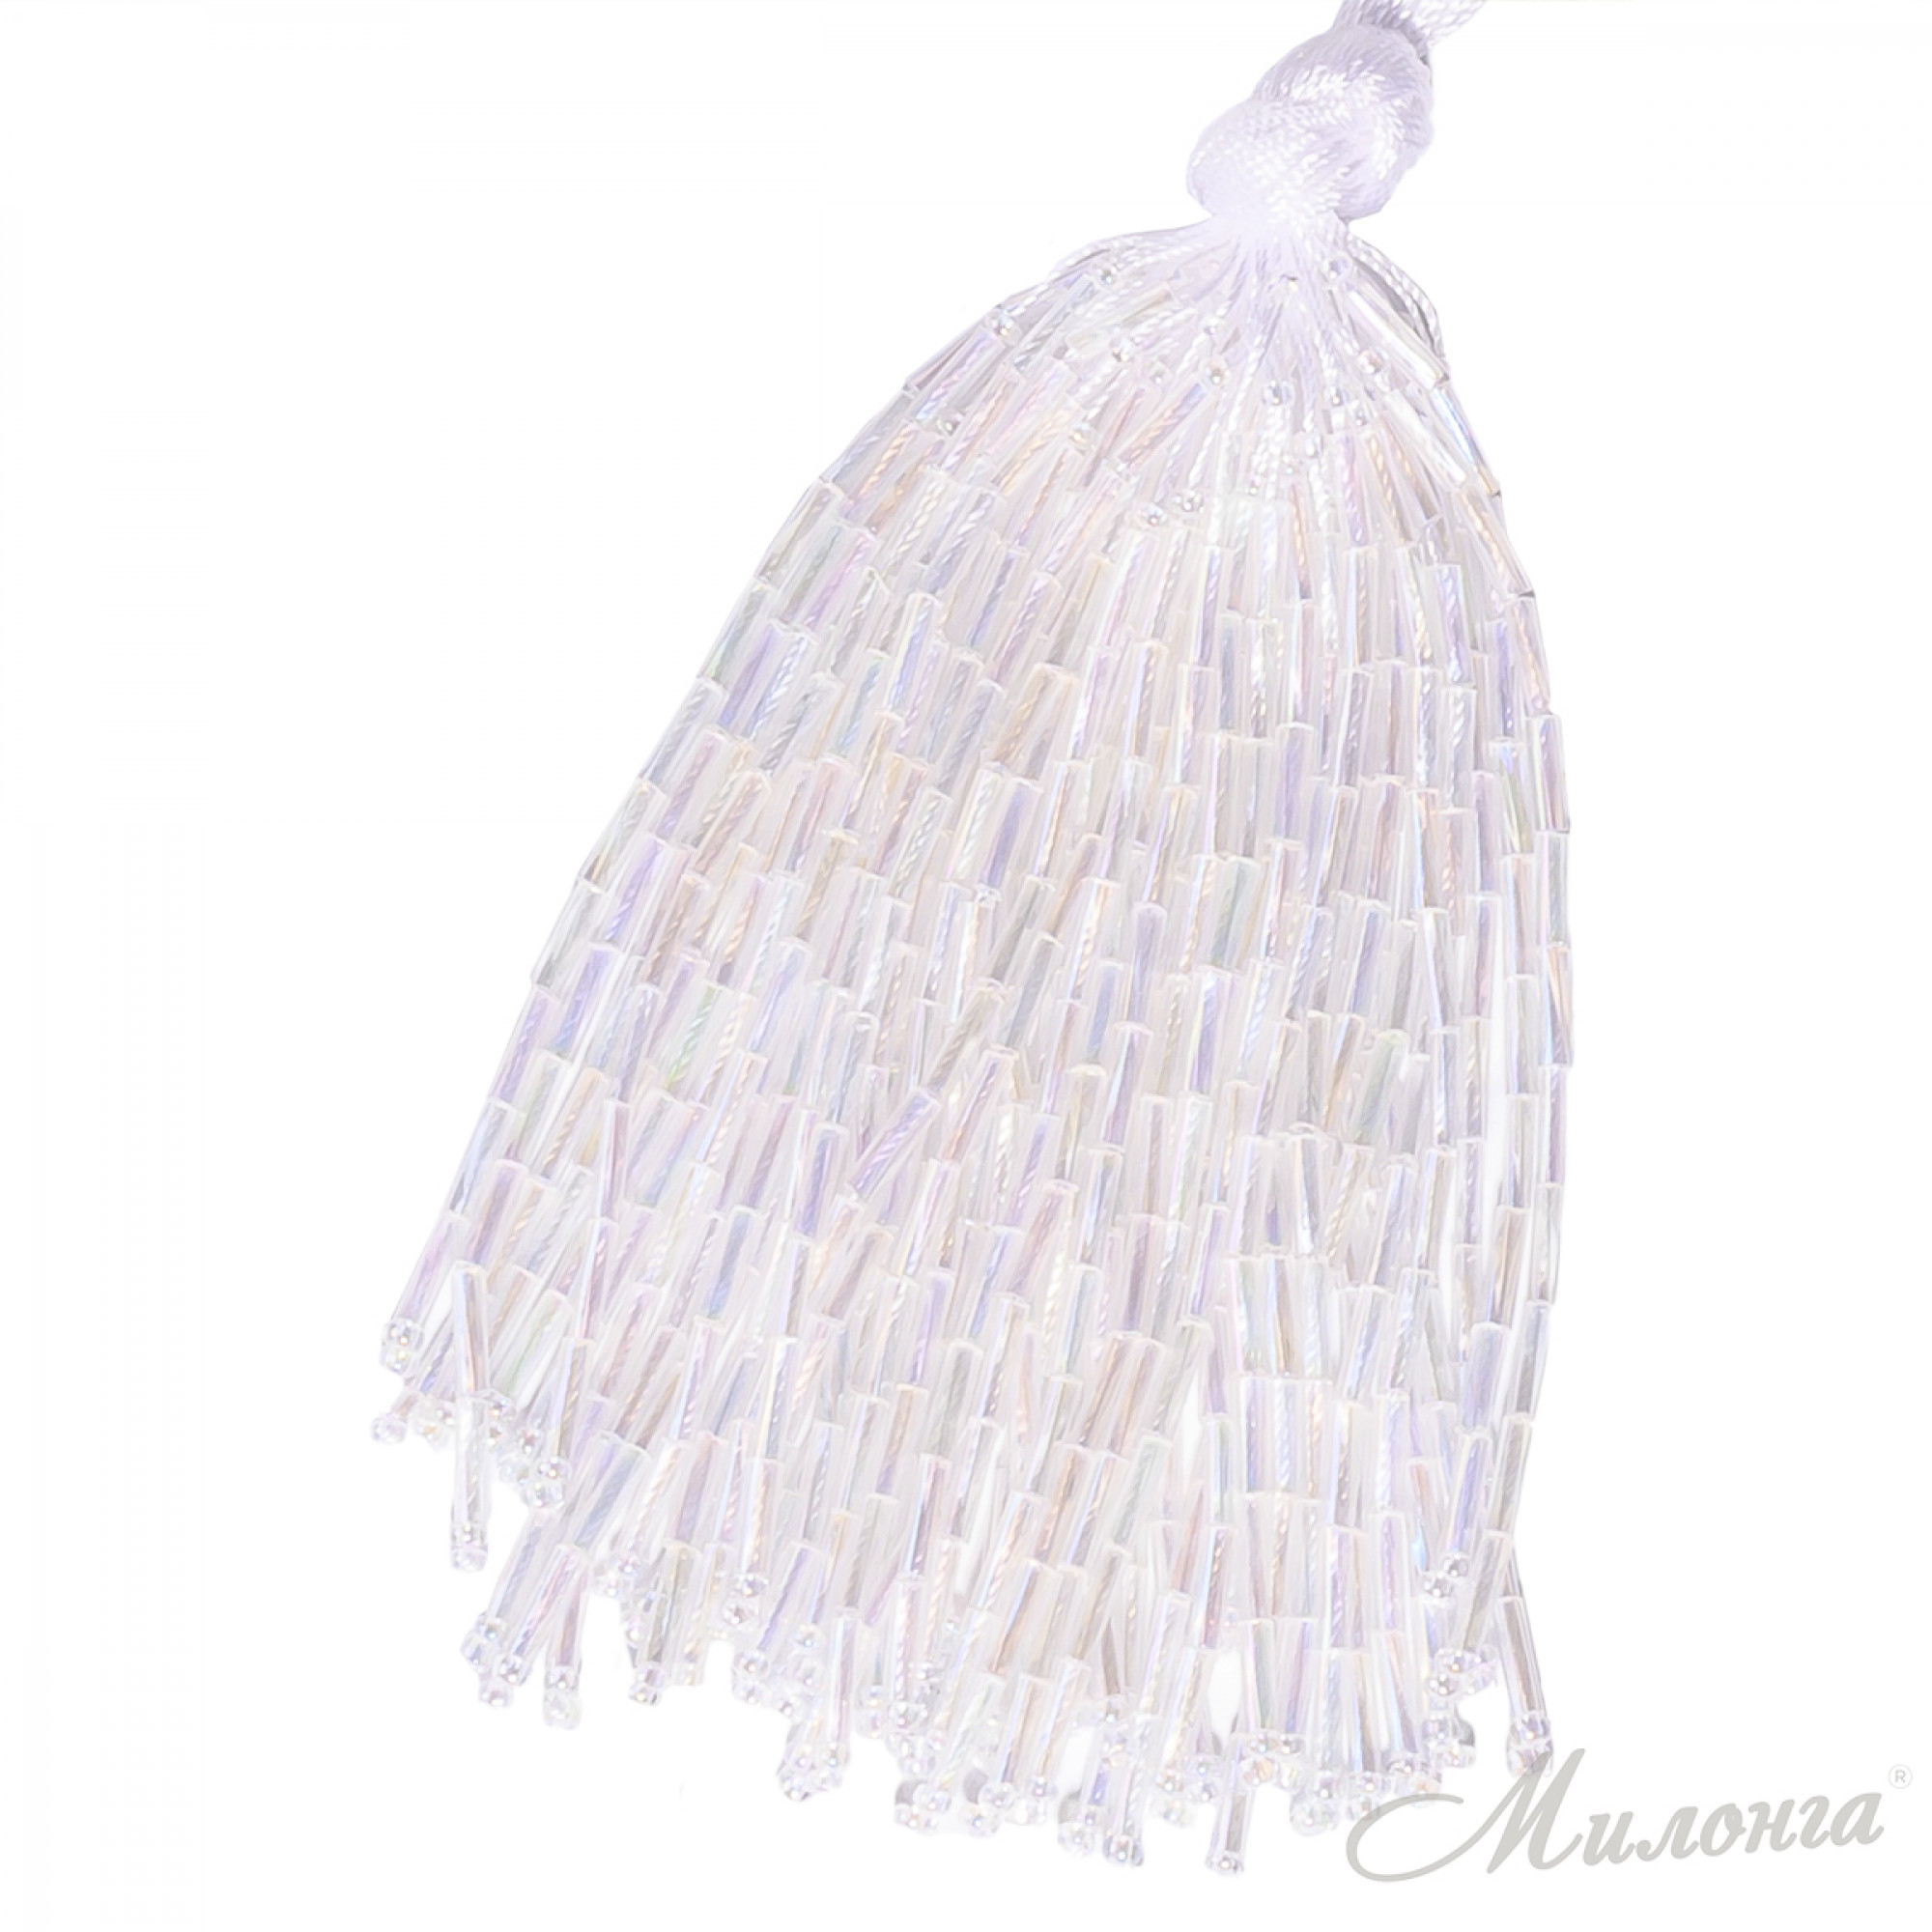 Стеклярус Chrisanne пучок (50 ниток) Crystal AB (White)